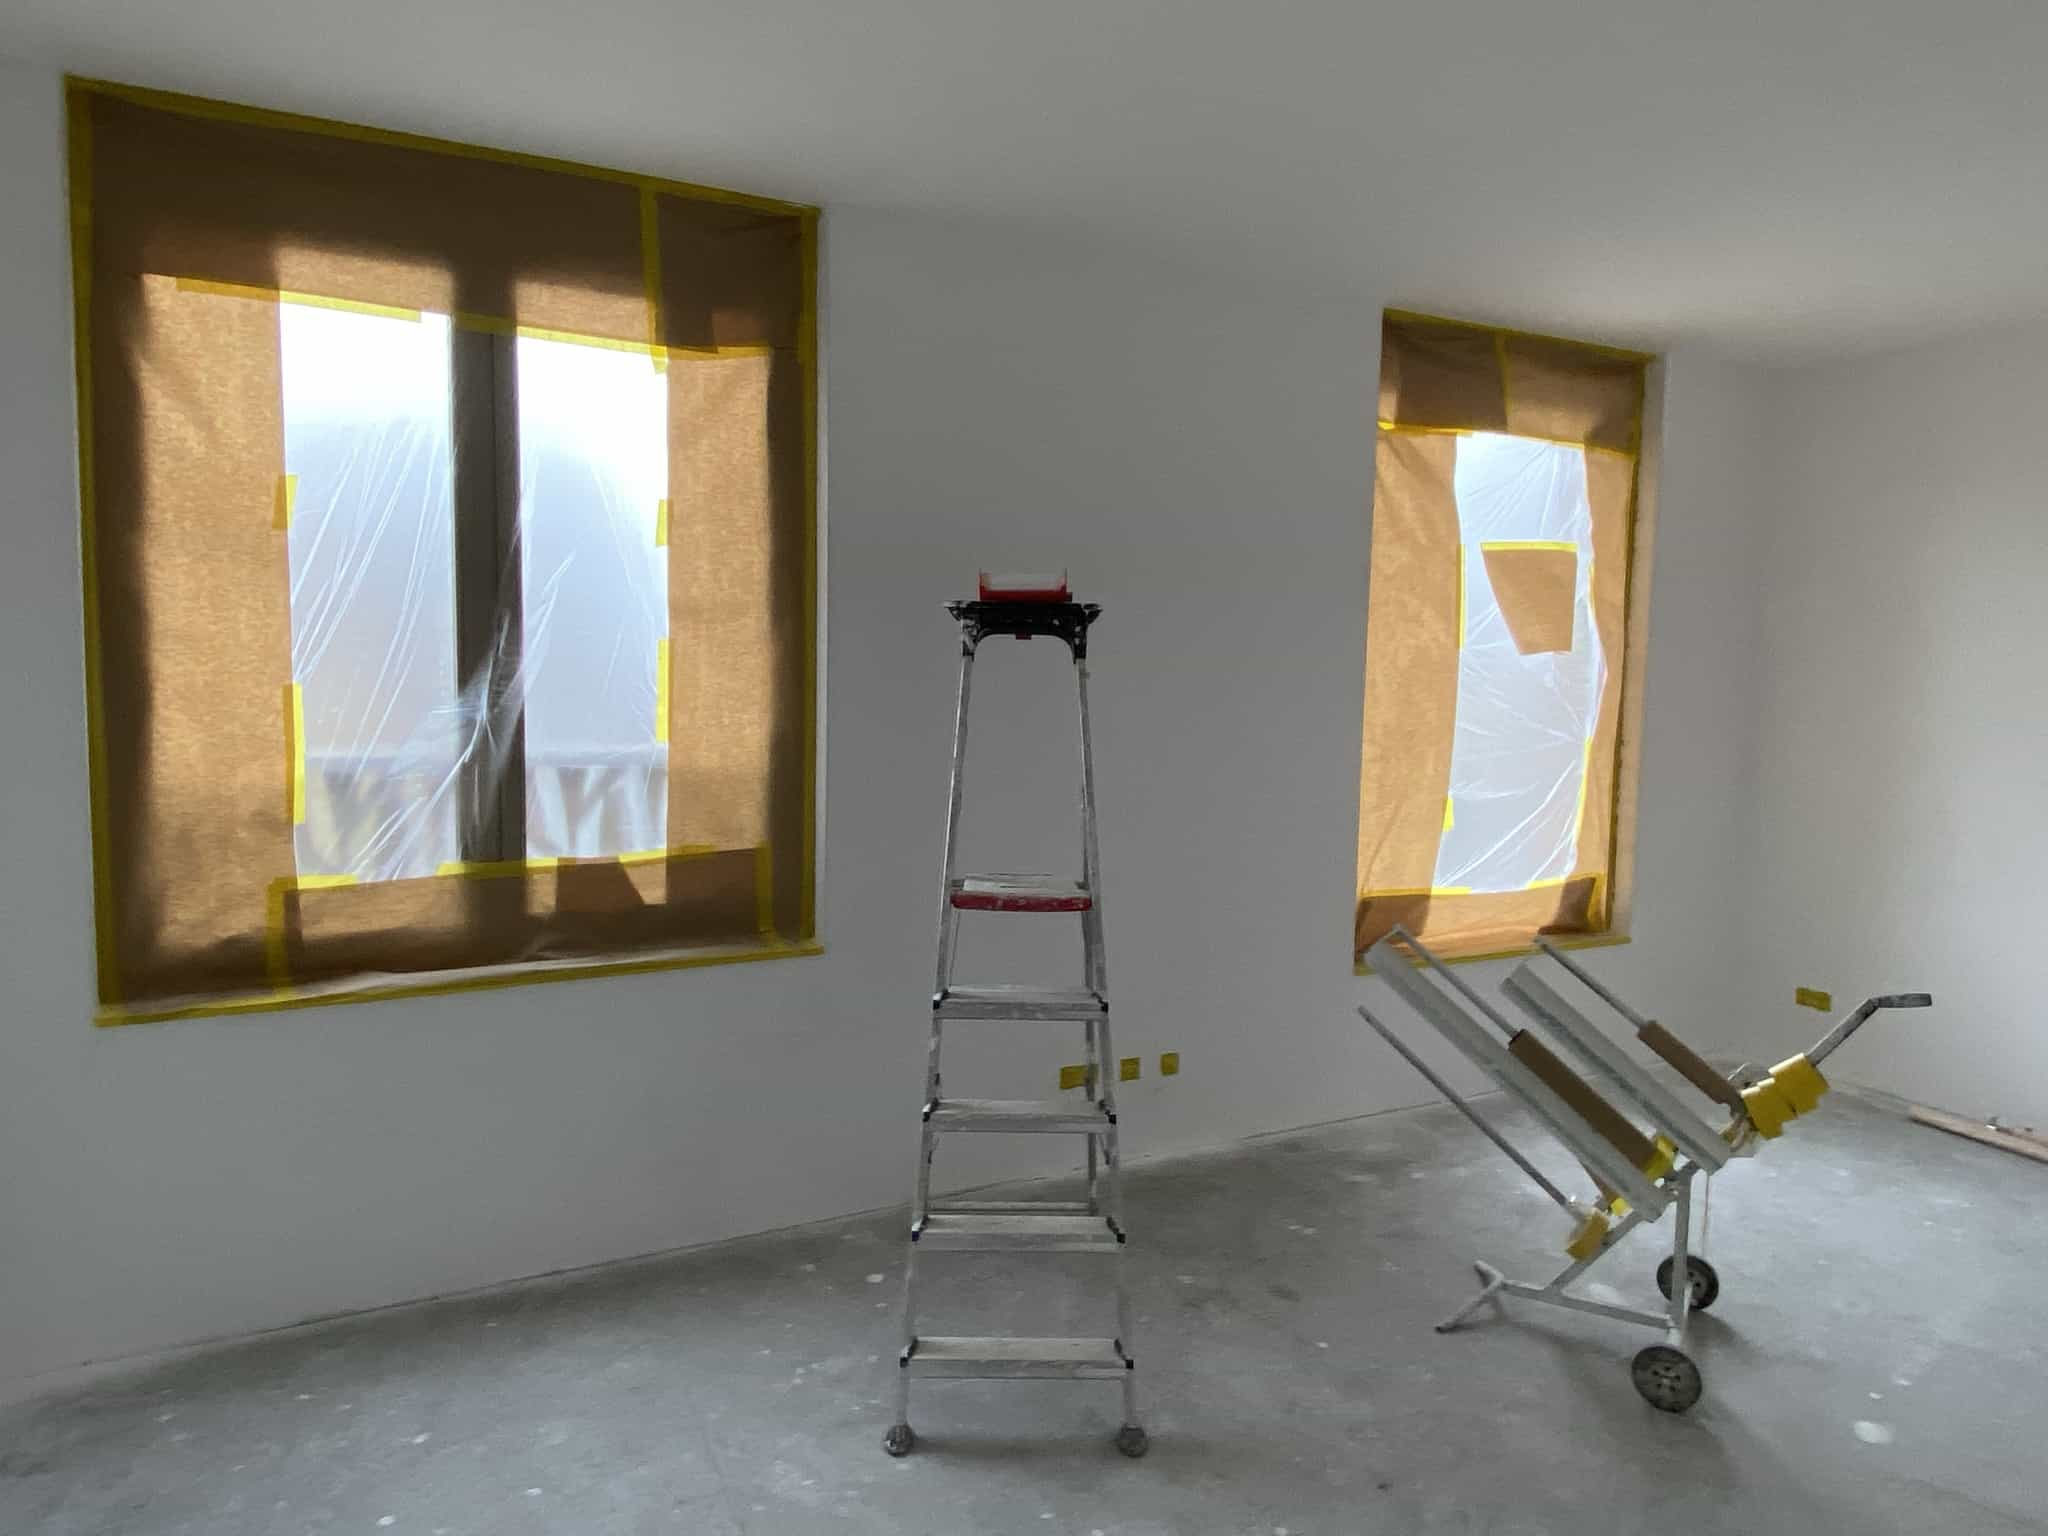 nieuwbouw woning afplakken